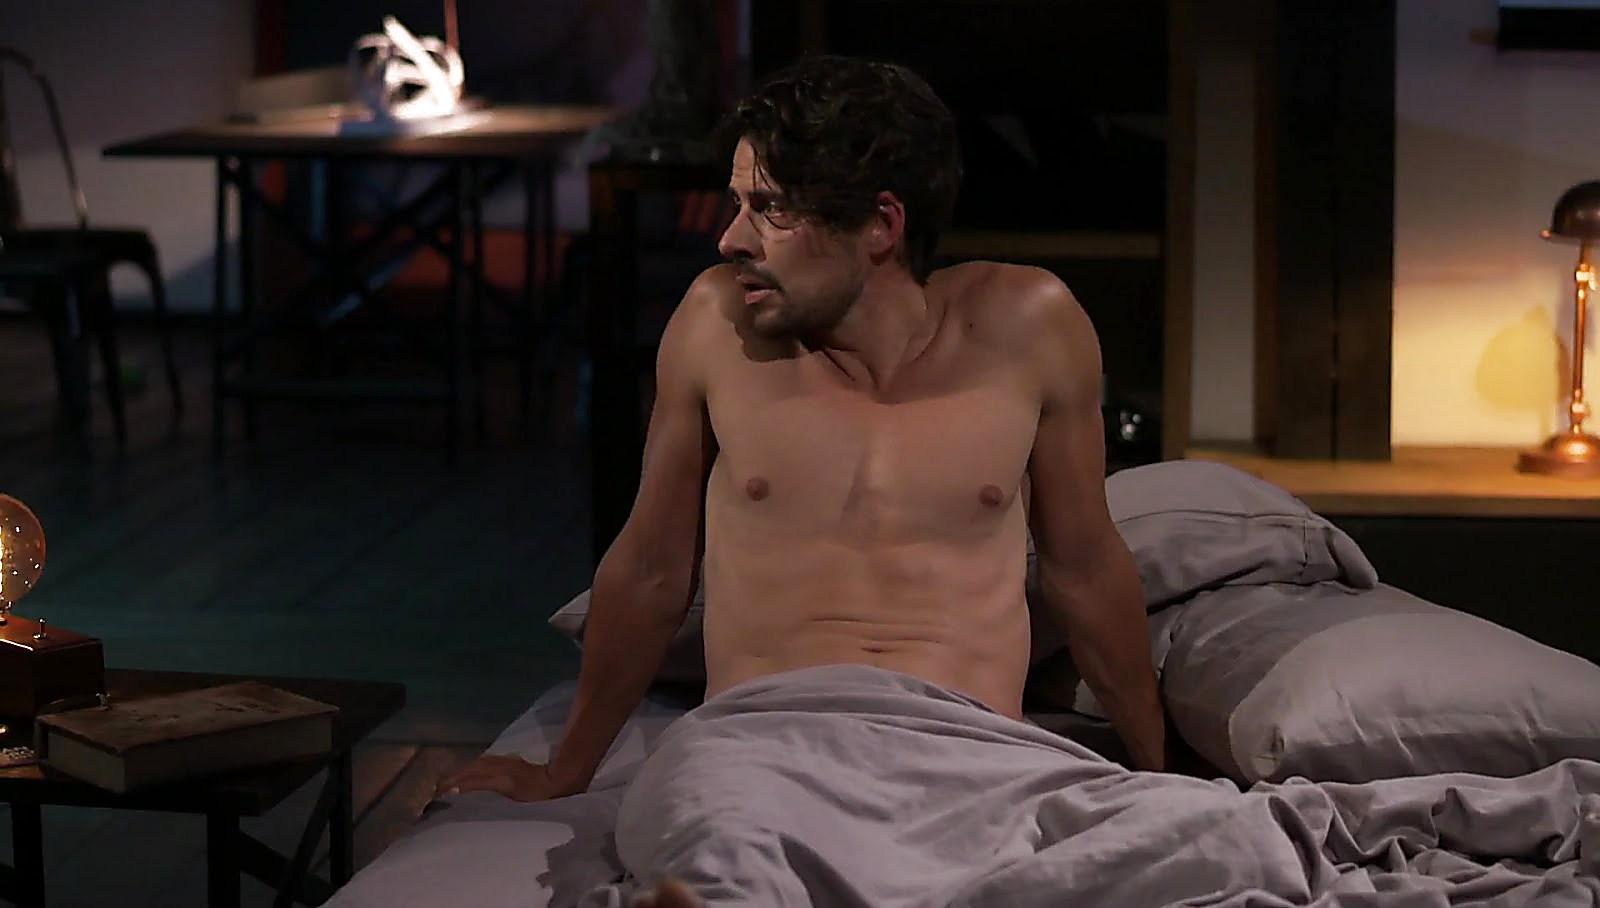 Manuel Balbi latest sexy shirtless scene August 12, 2017, 10am